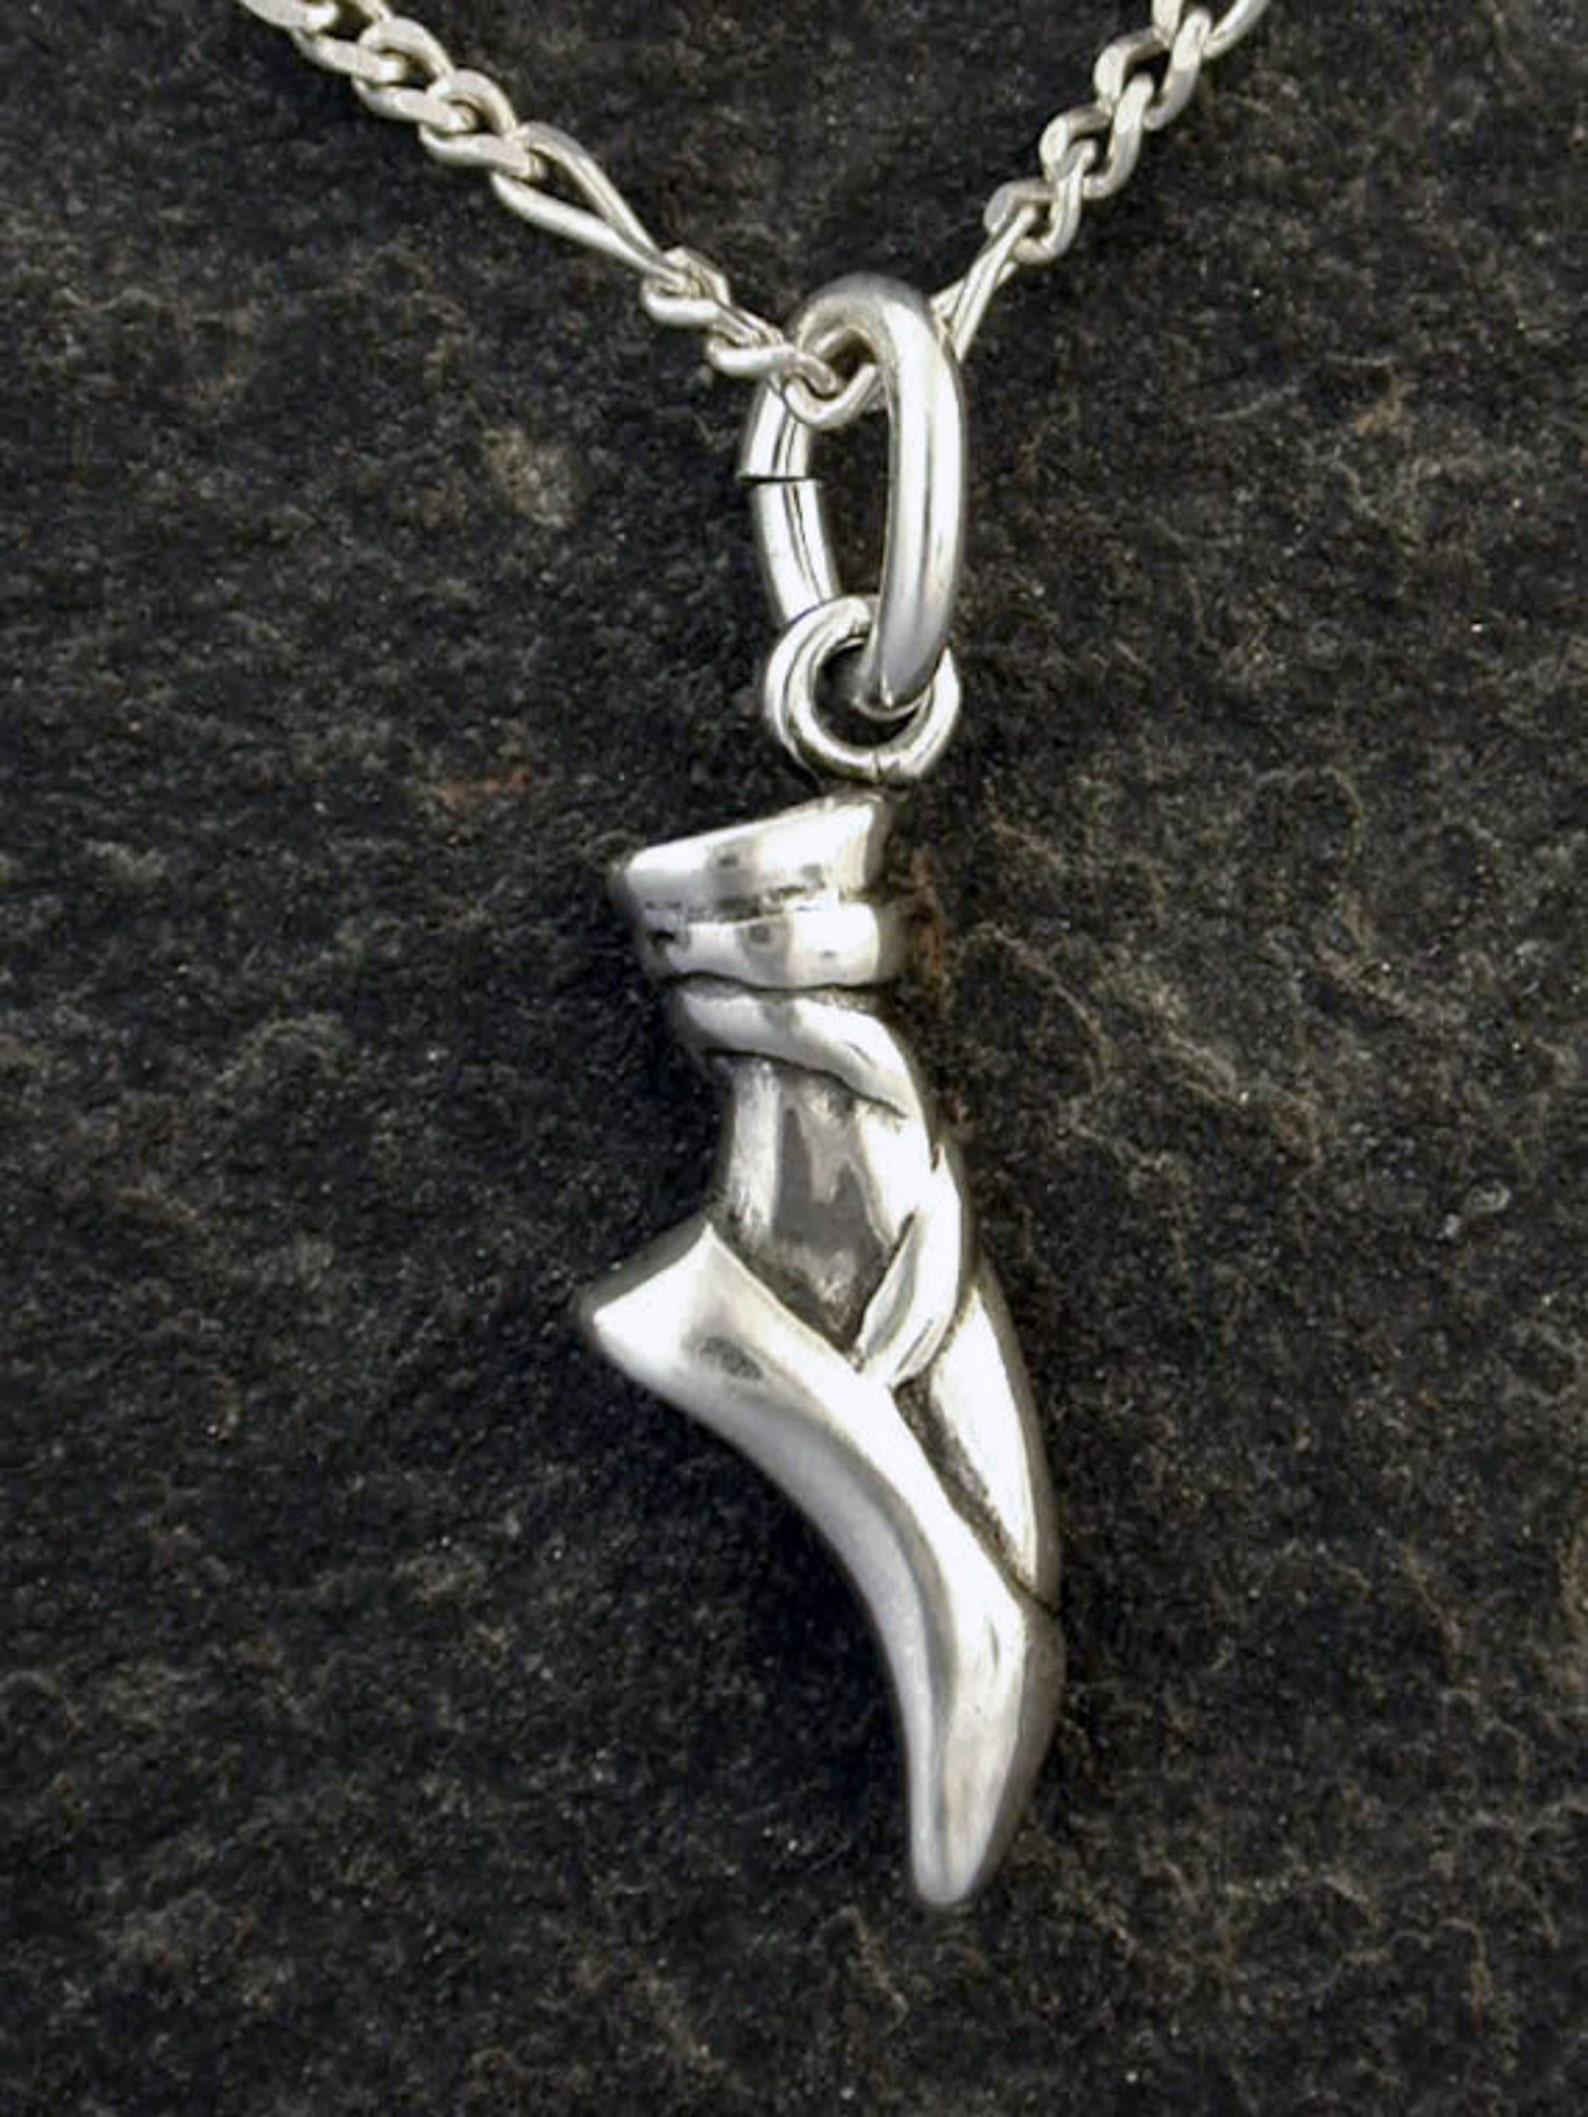 sterling silver ballet slipper shoe pendant on sterling silver chain.